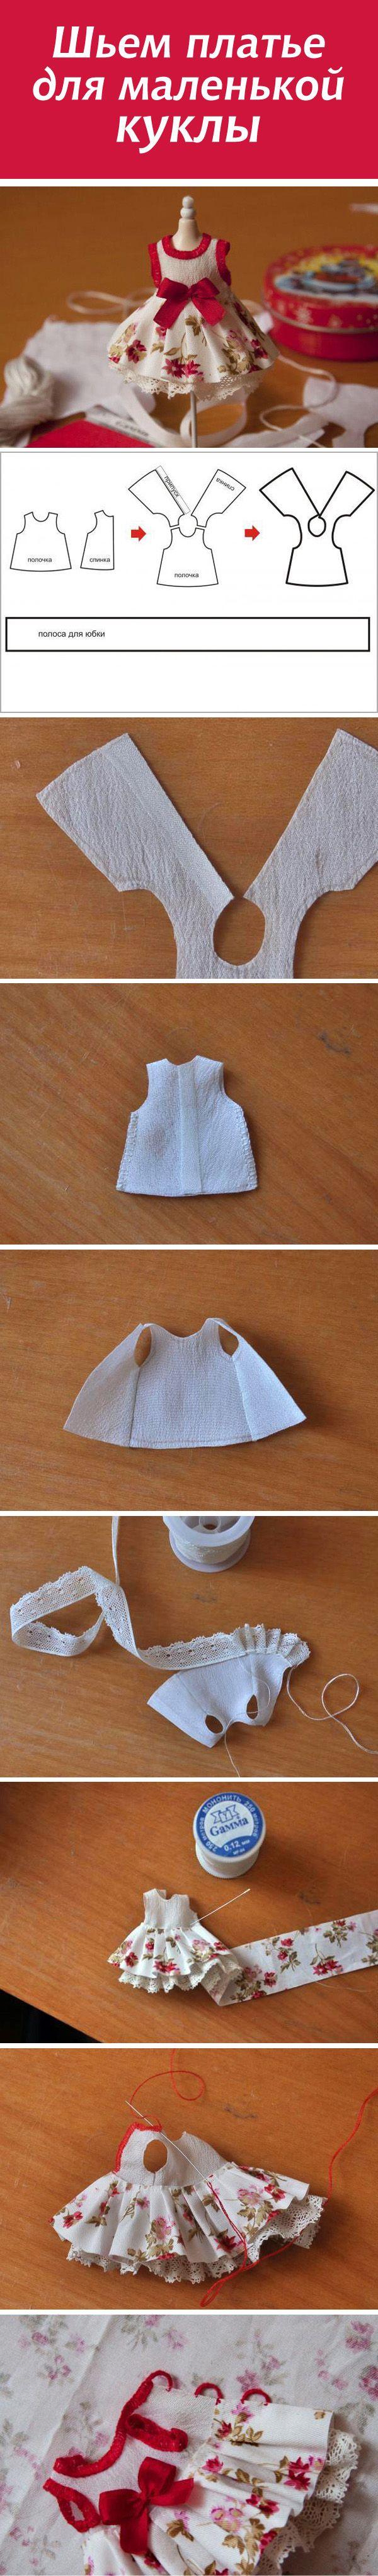 Шьем платье для маленькой куклы / Doll Outfit Tutorial #diy #tutorial #howto #doll #dolloutfit #toydoll